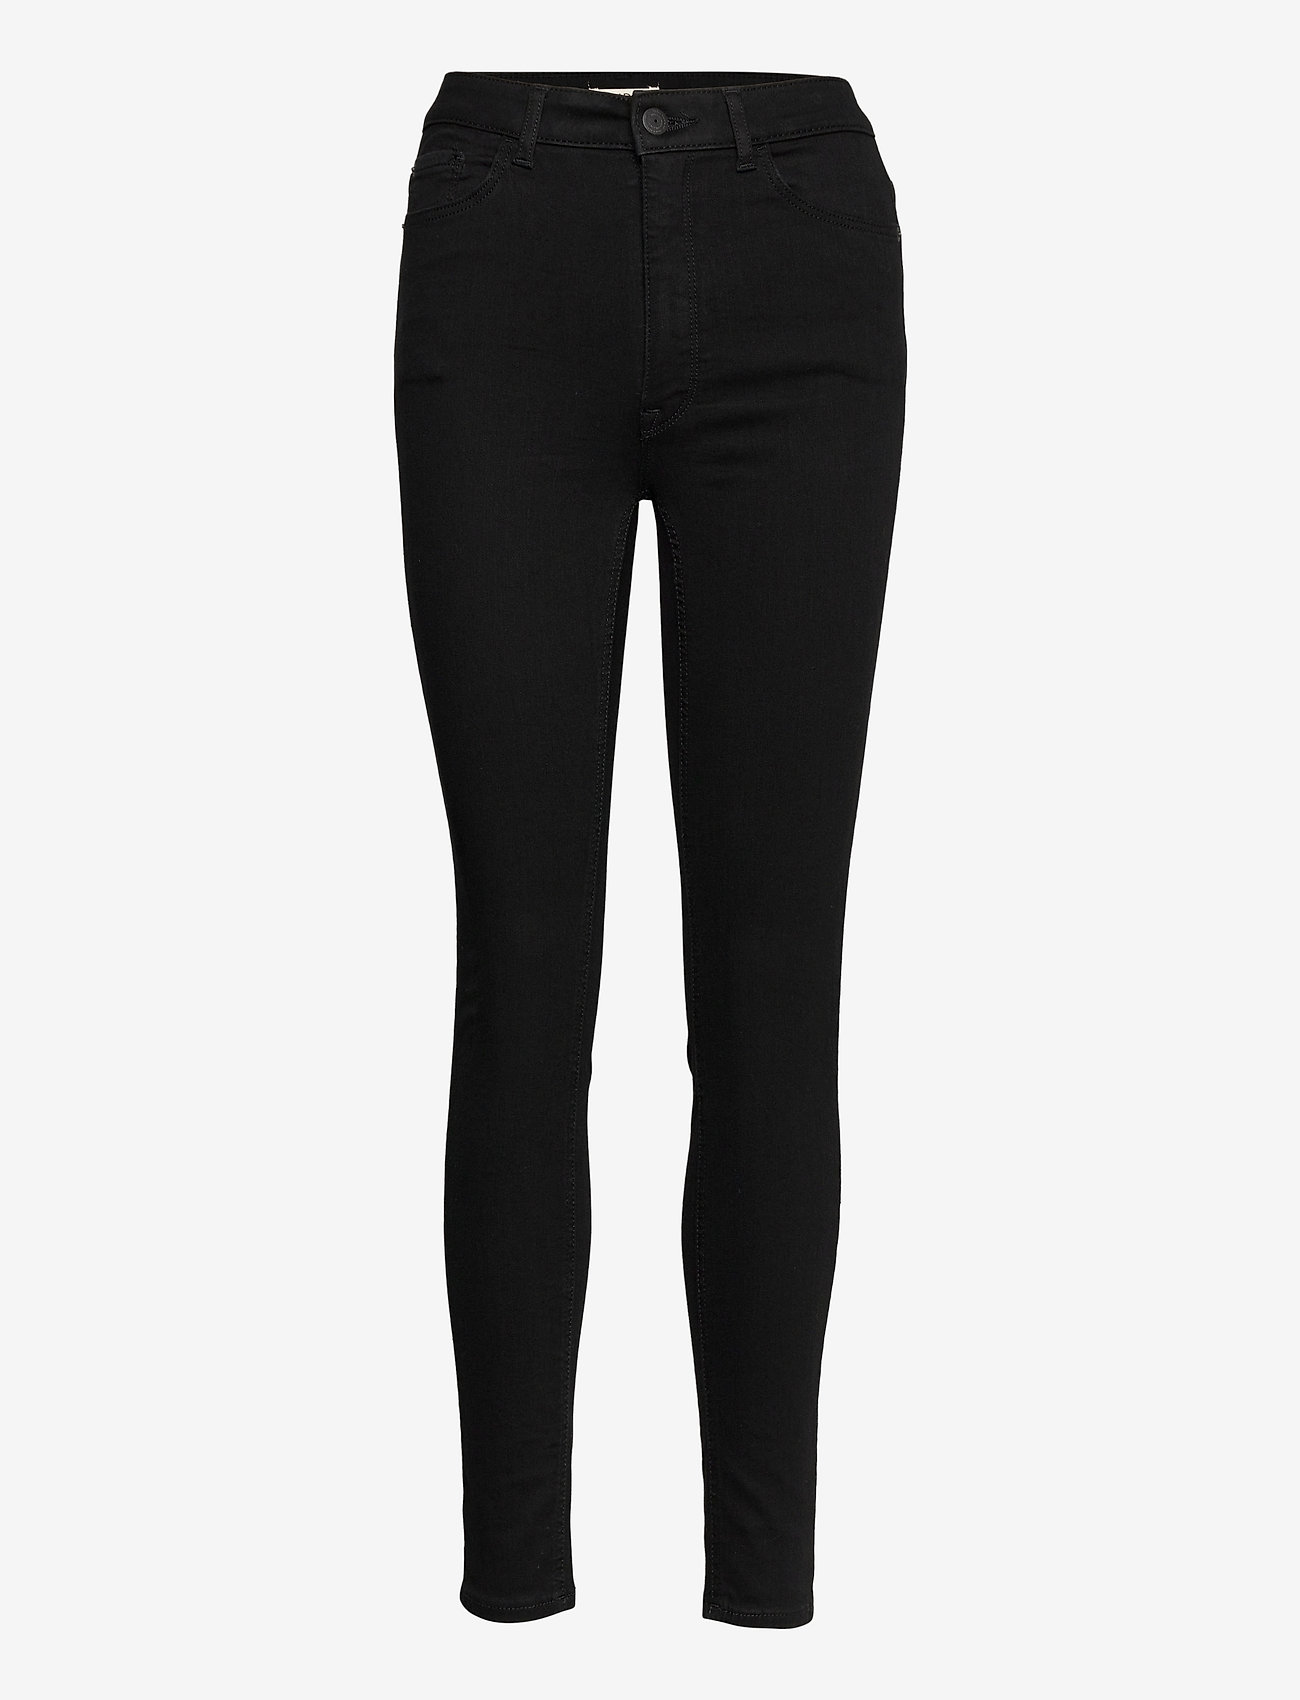 Lindex - Trs denim Vera HW black - skinny jeans - black - 0